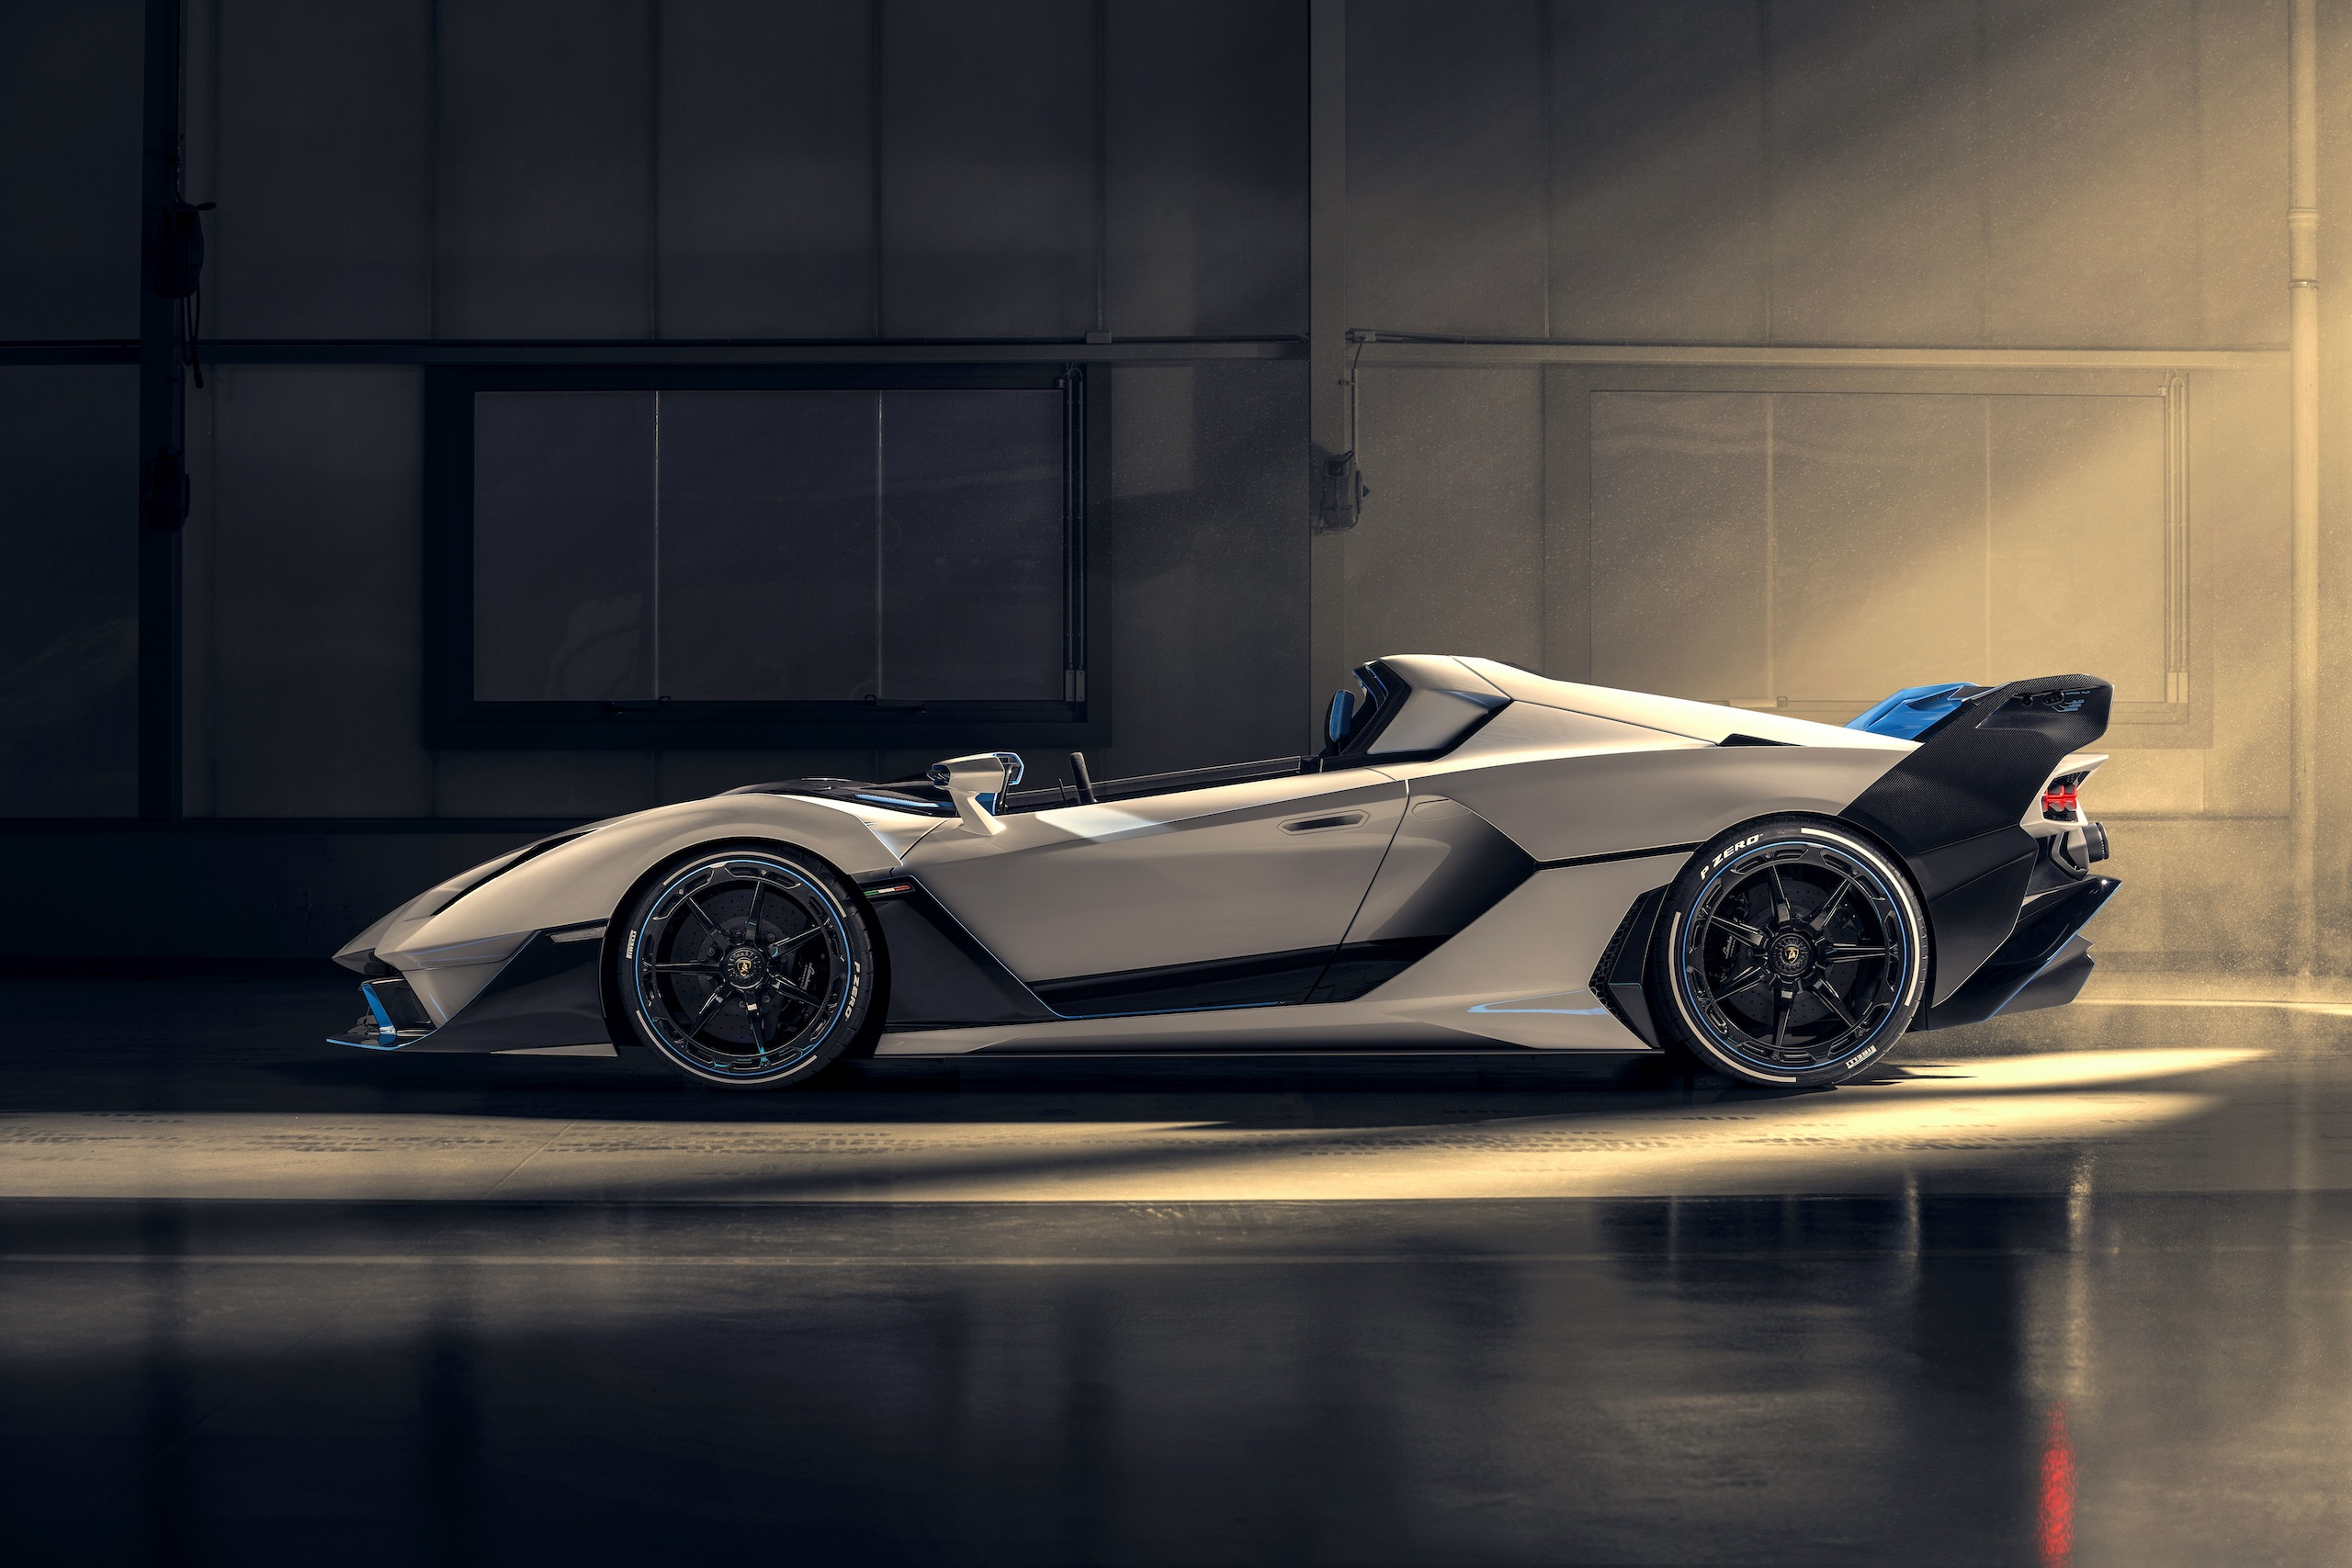 Lamborghini SC20 side profile